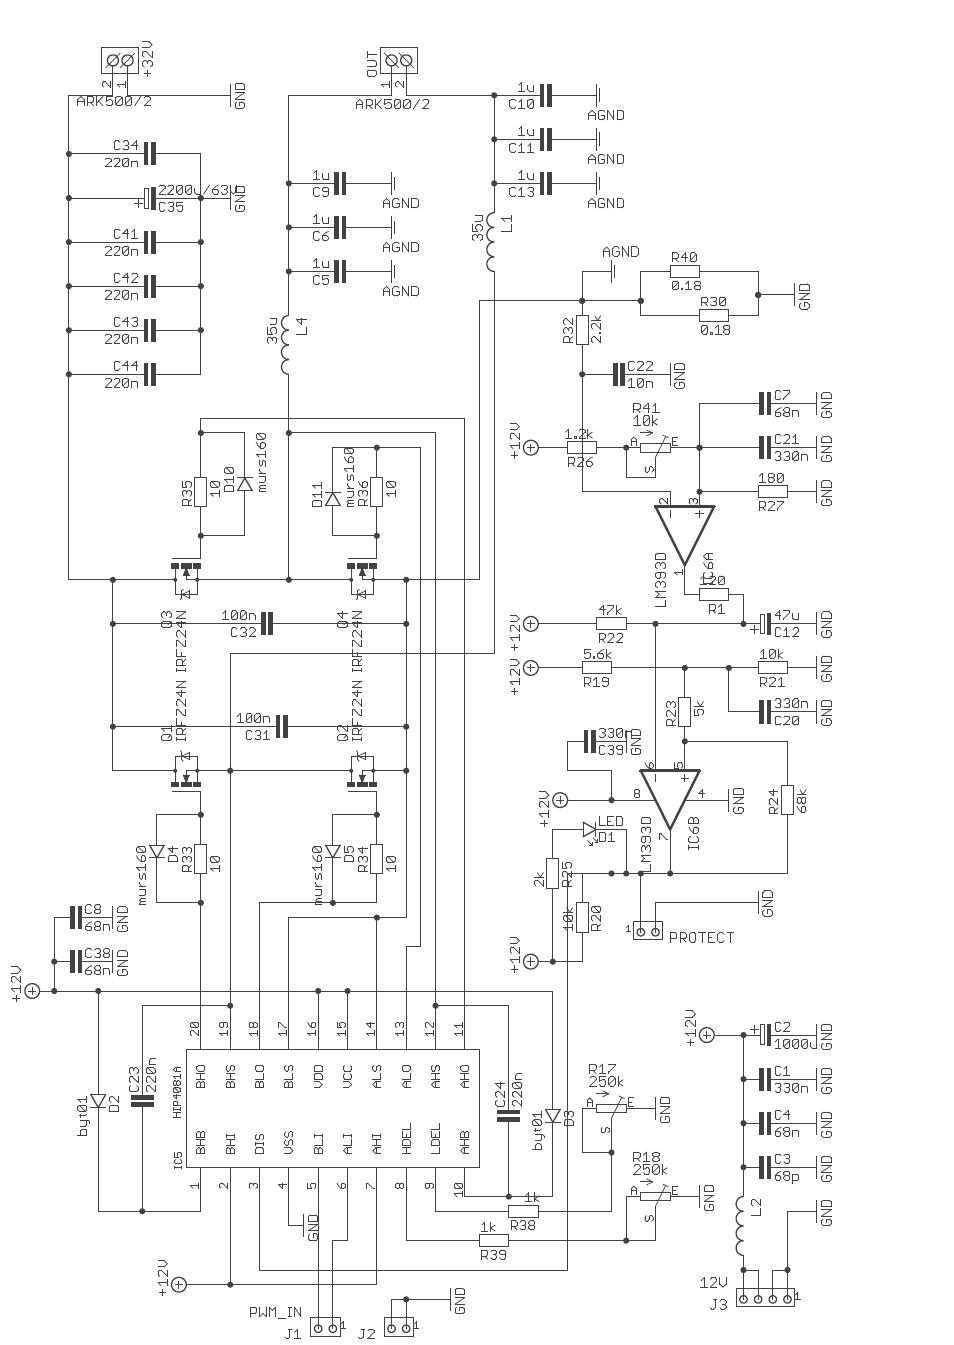 Schematic Diagram Of Class D Amplifier Max98304 Circuit Wiring File Archive Digital Tas5706a Pcm1850a Atmega128